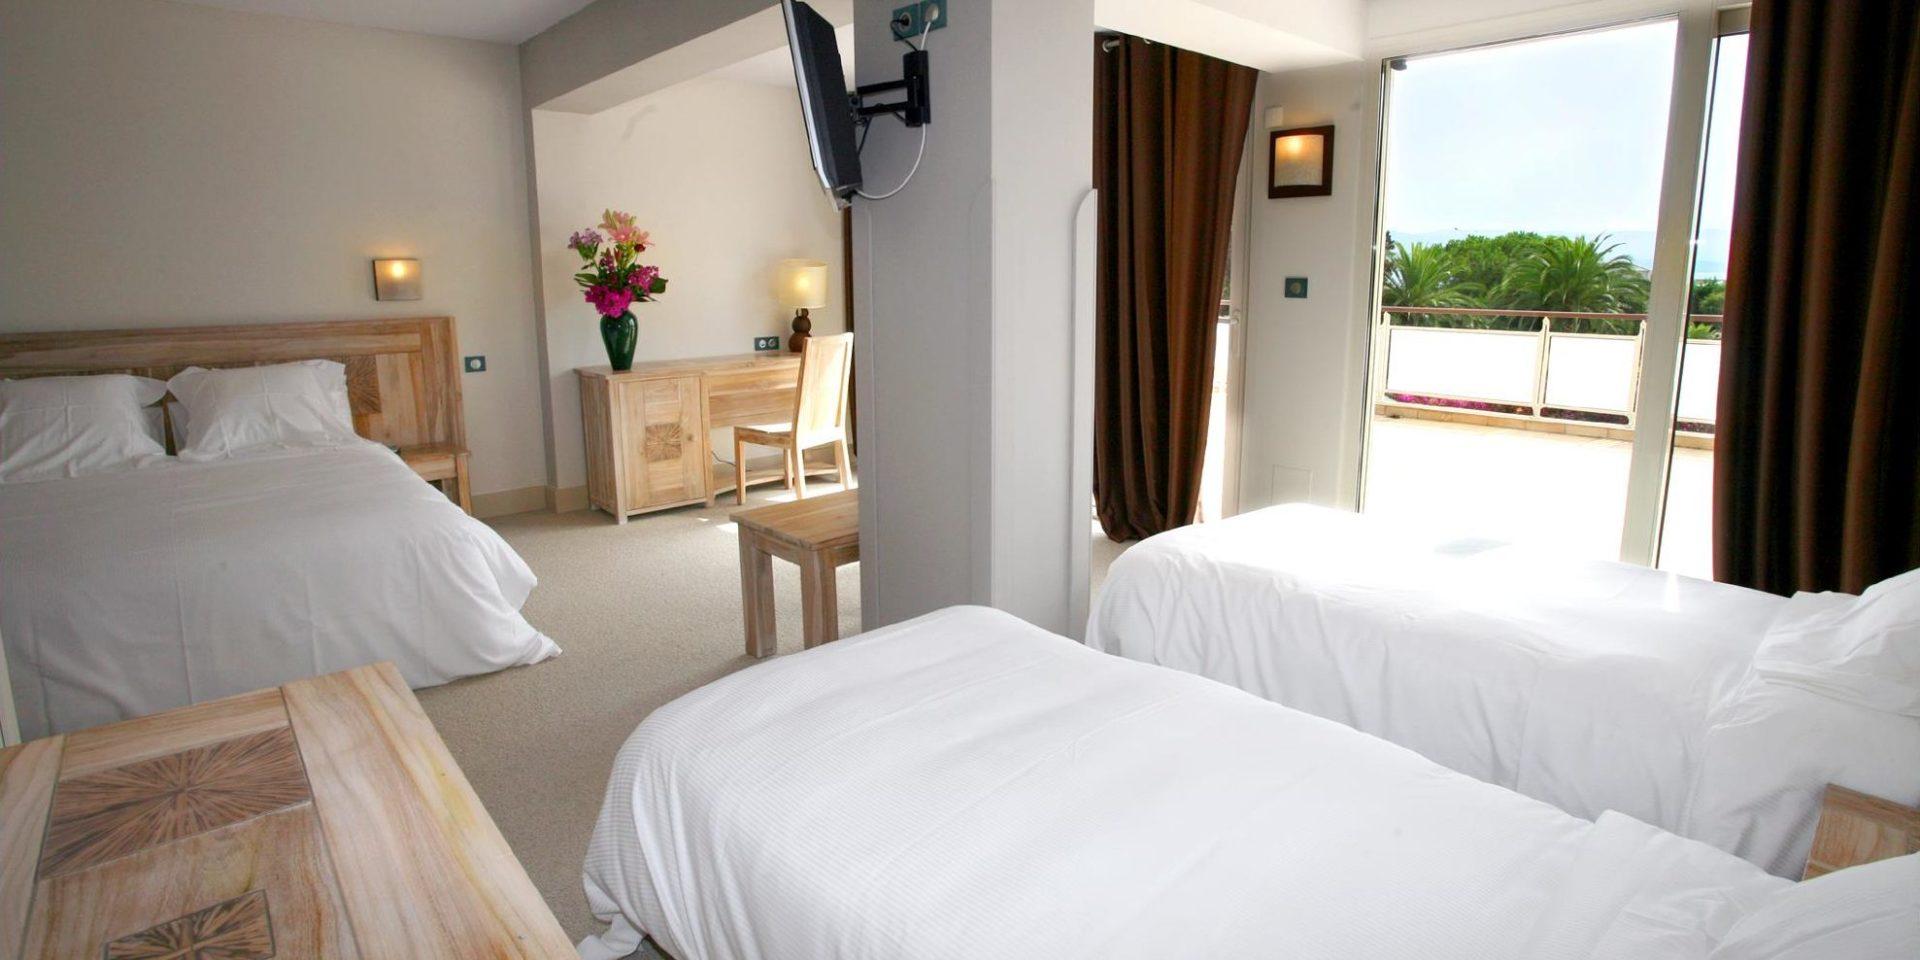 Hotel Campo dell'Oro Ajaccio Corsica Frankrijk vierpersoonskamer familiekamer Mer